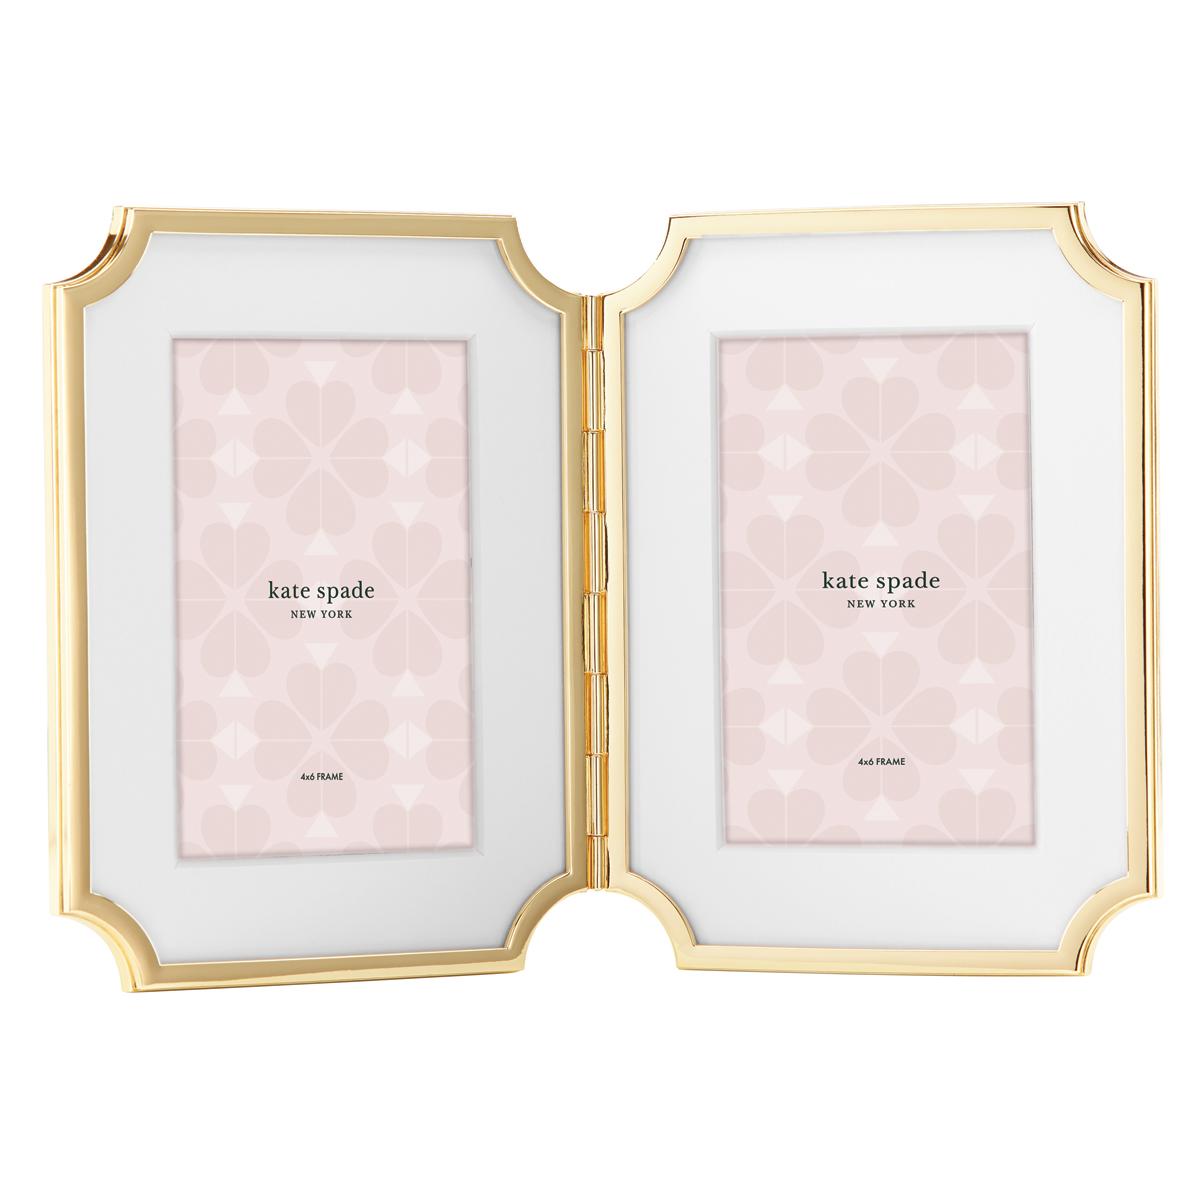 Kate Spade New York, Lenox Sullivan St Gold 4x6 Hinged Double Frame